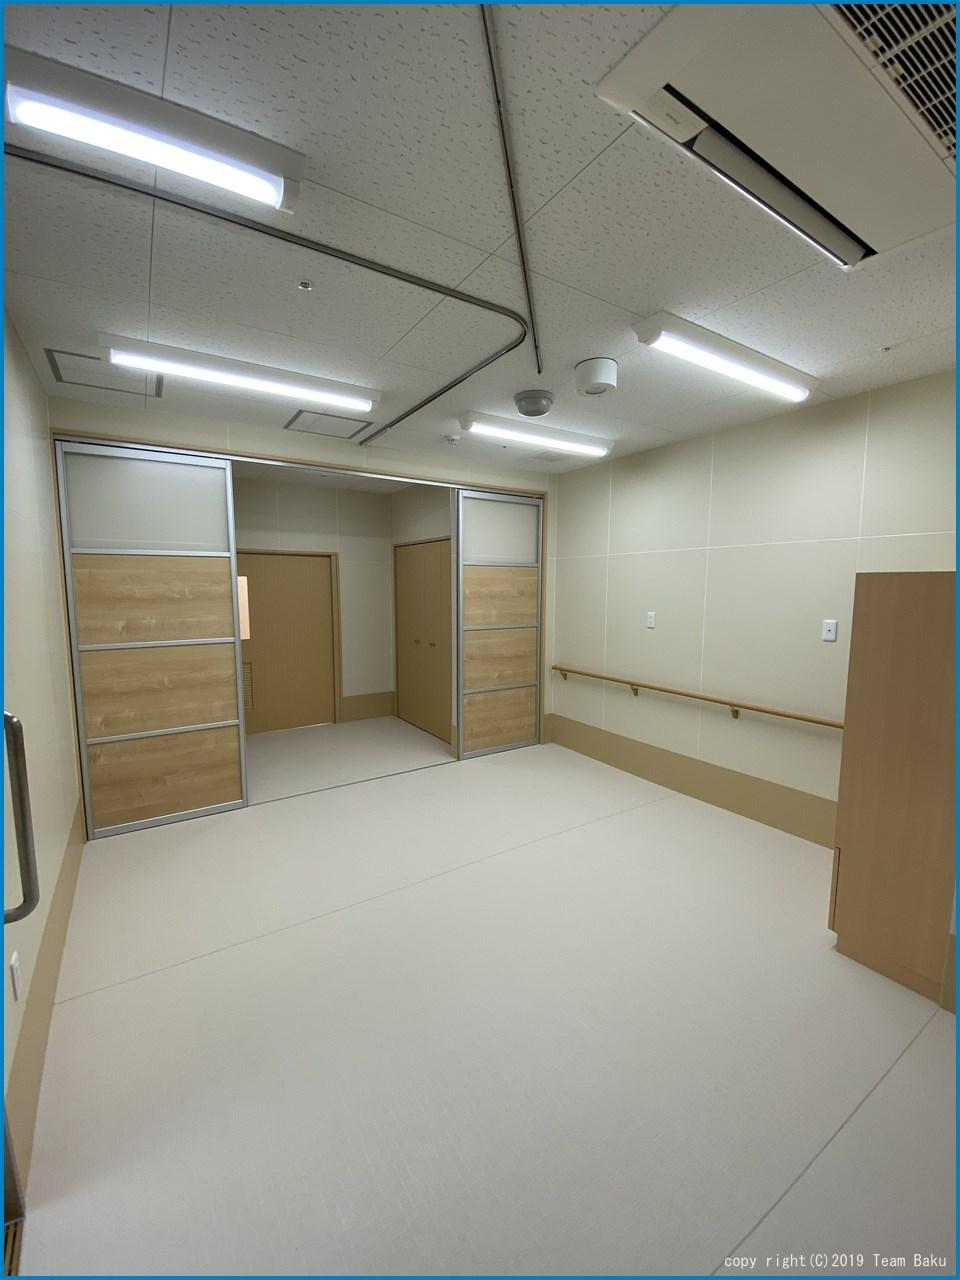 N病院グループ Nナーシング南館 改修・増築工事 5_c0376508_13044285.jpg